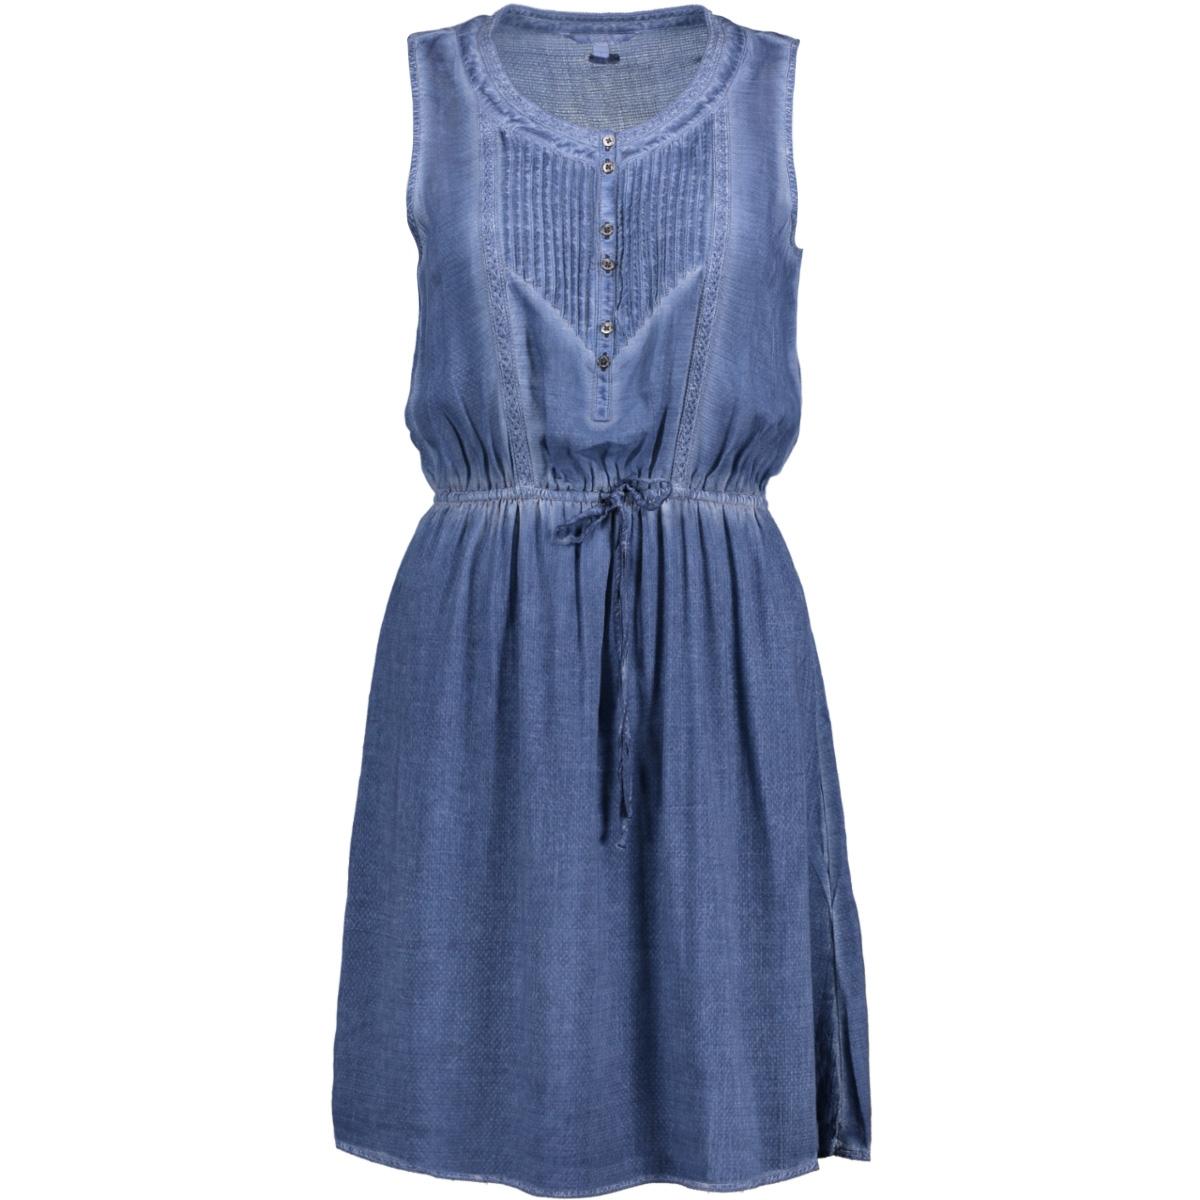 5019826.00.71 tom tailor jurk 6593